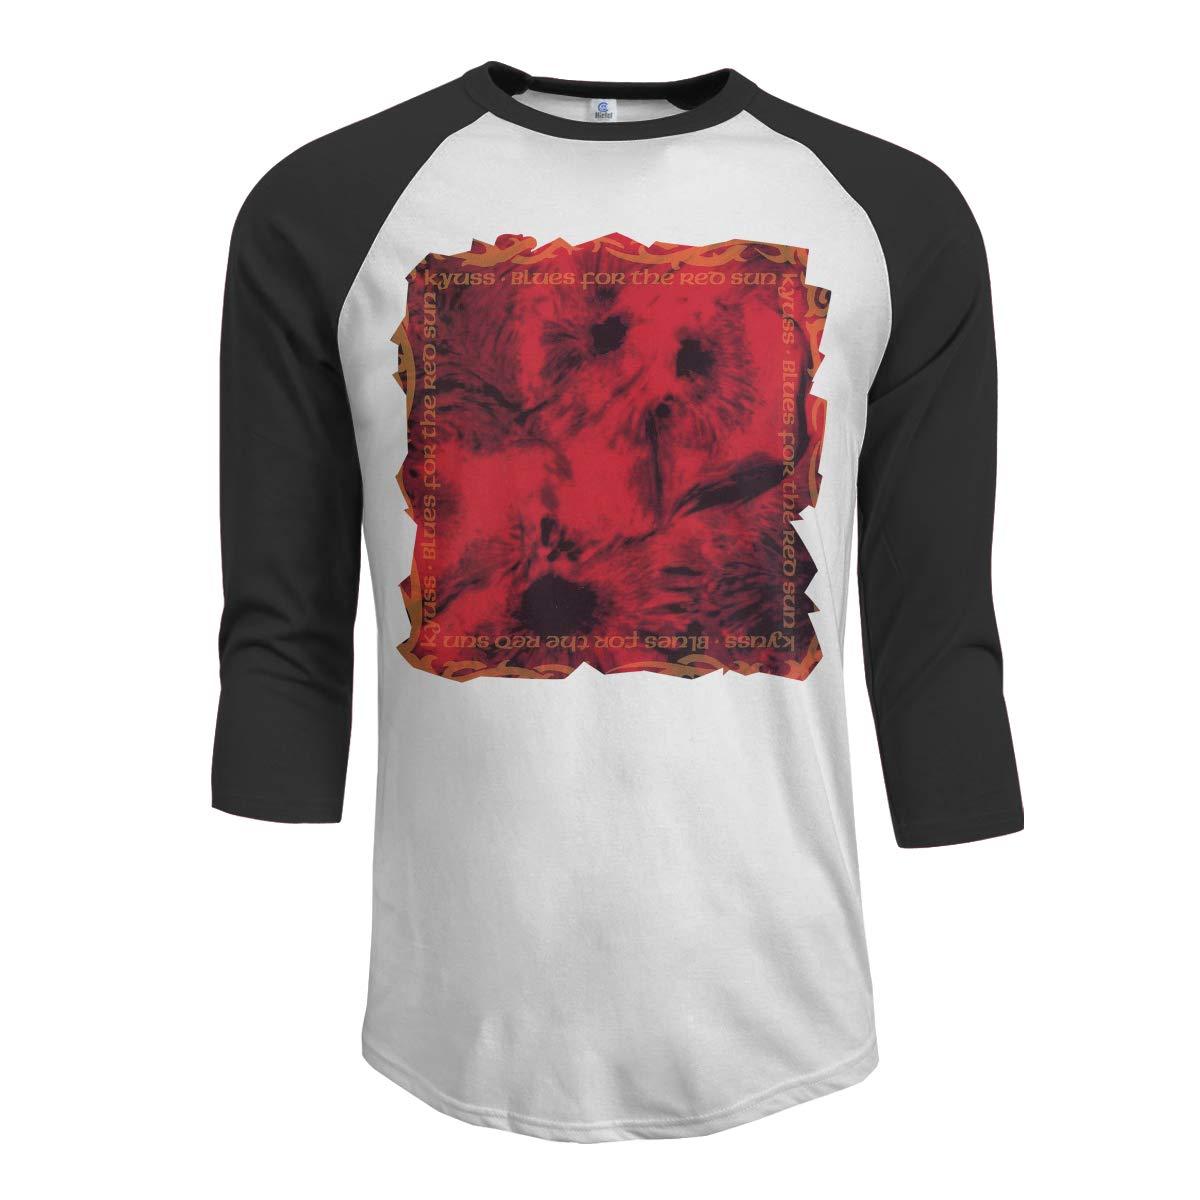 JeremiahR Kyuss Blues for The Red Sun Mens 3//4 Sleeve Raglan Baseball T-Shirt Black